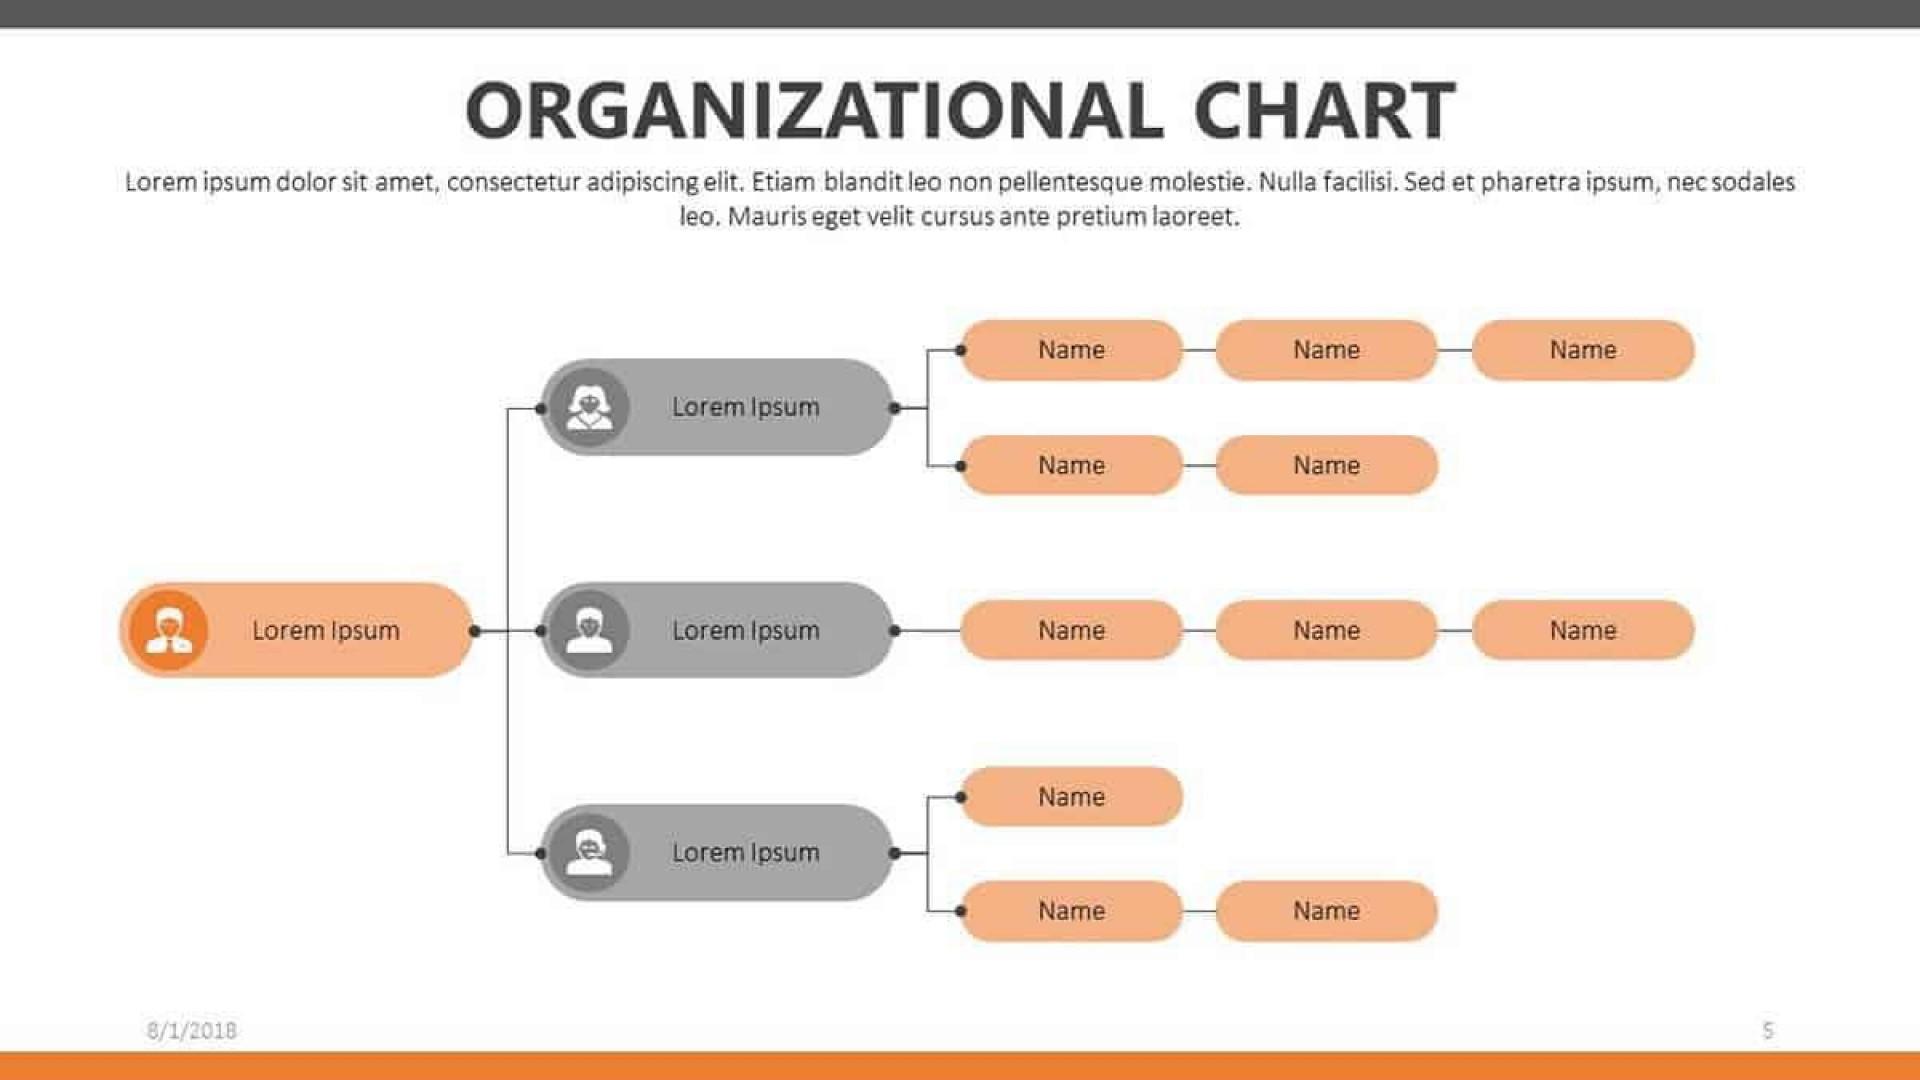 009 Stunning Org Chart Template Powerpoint Example  Free Organization Download Organizational 20101920